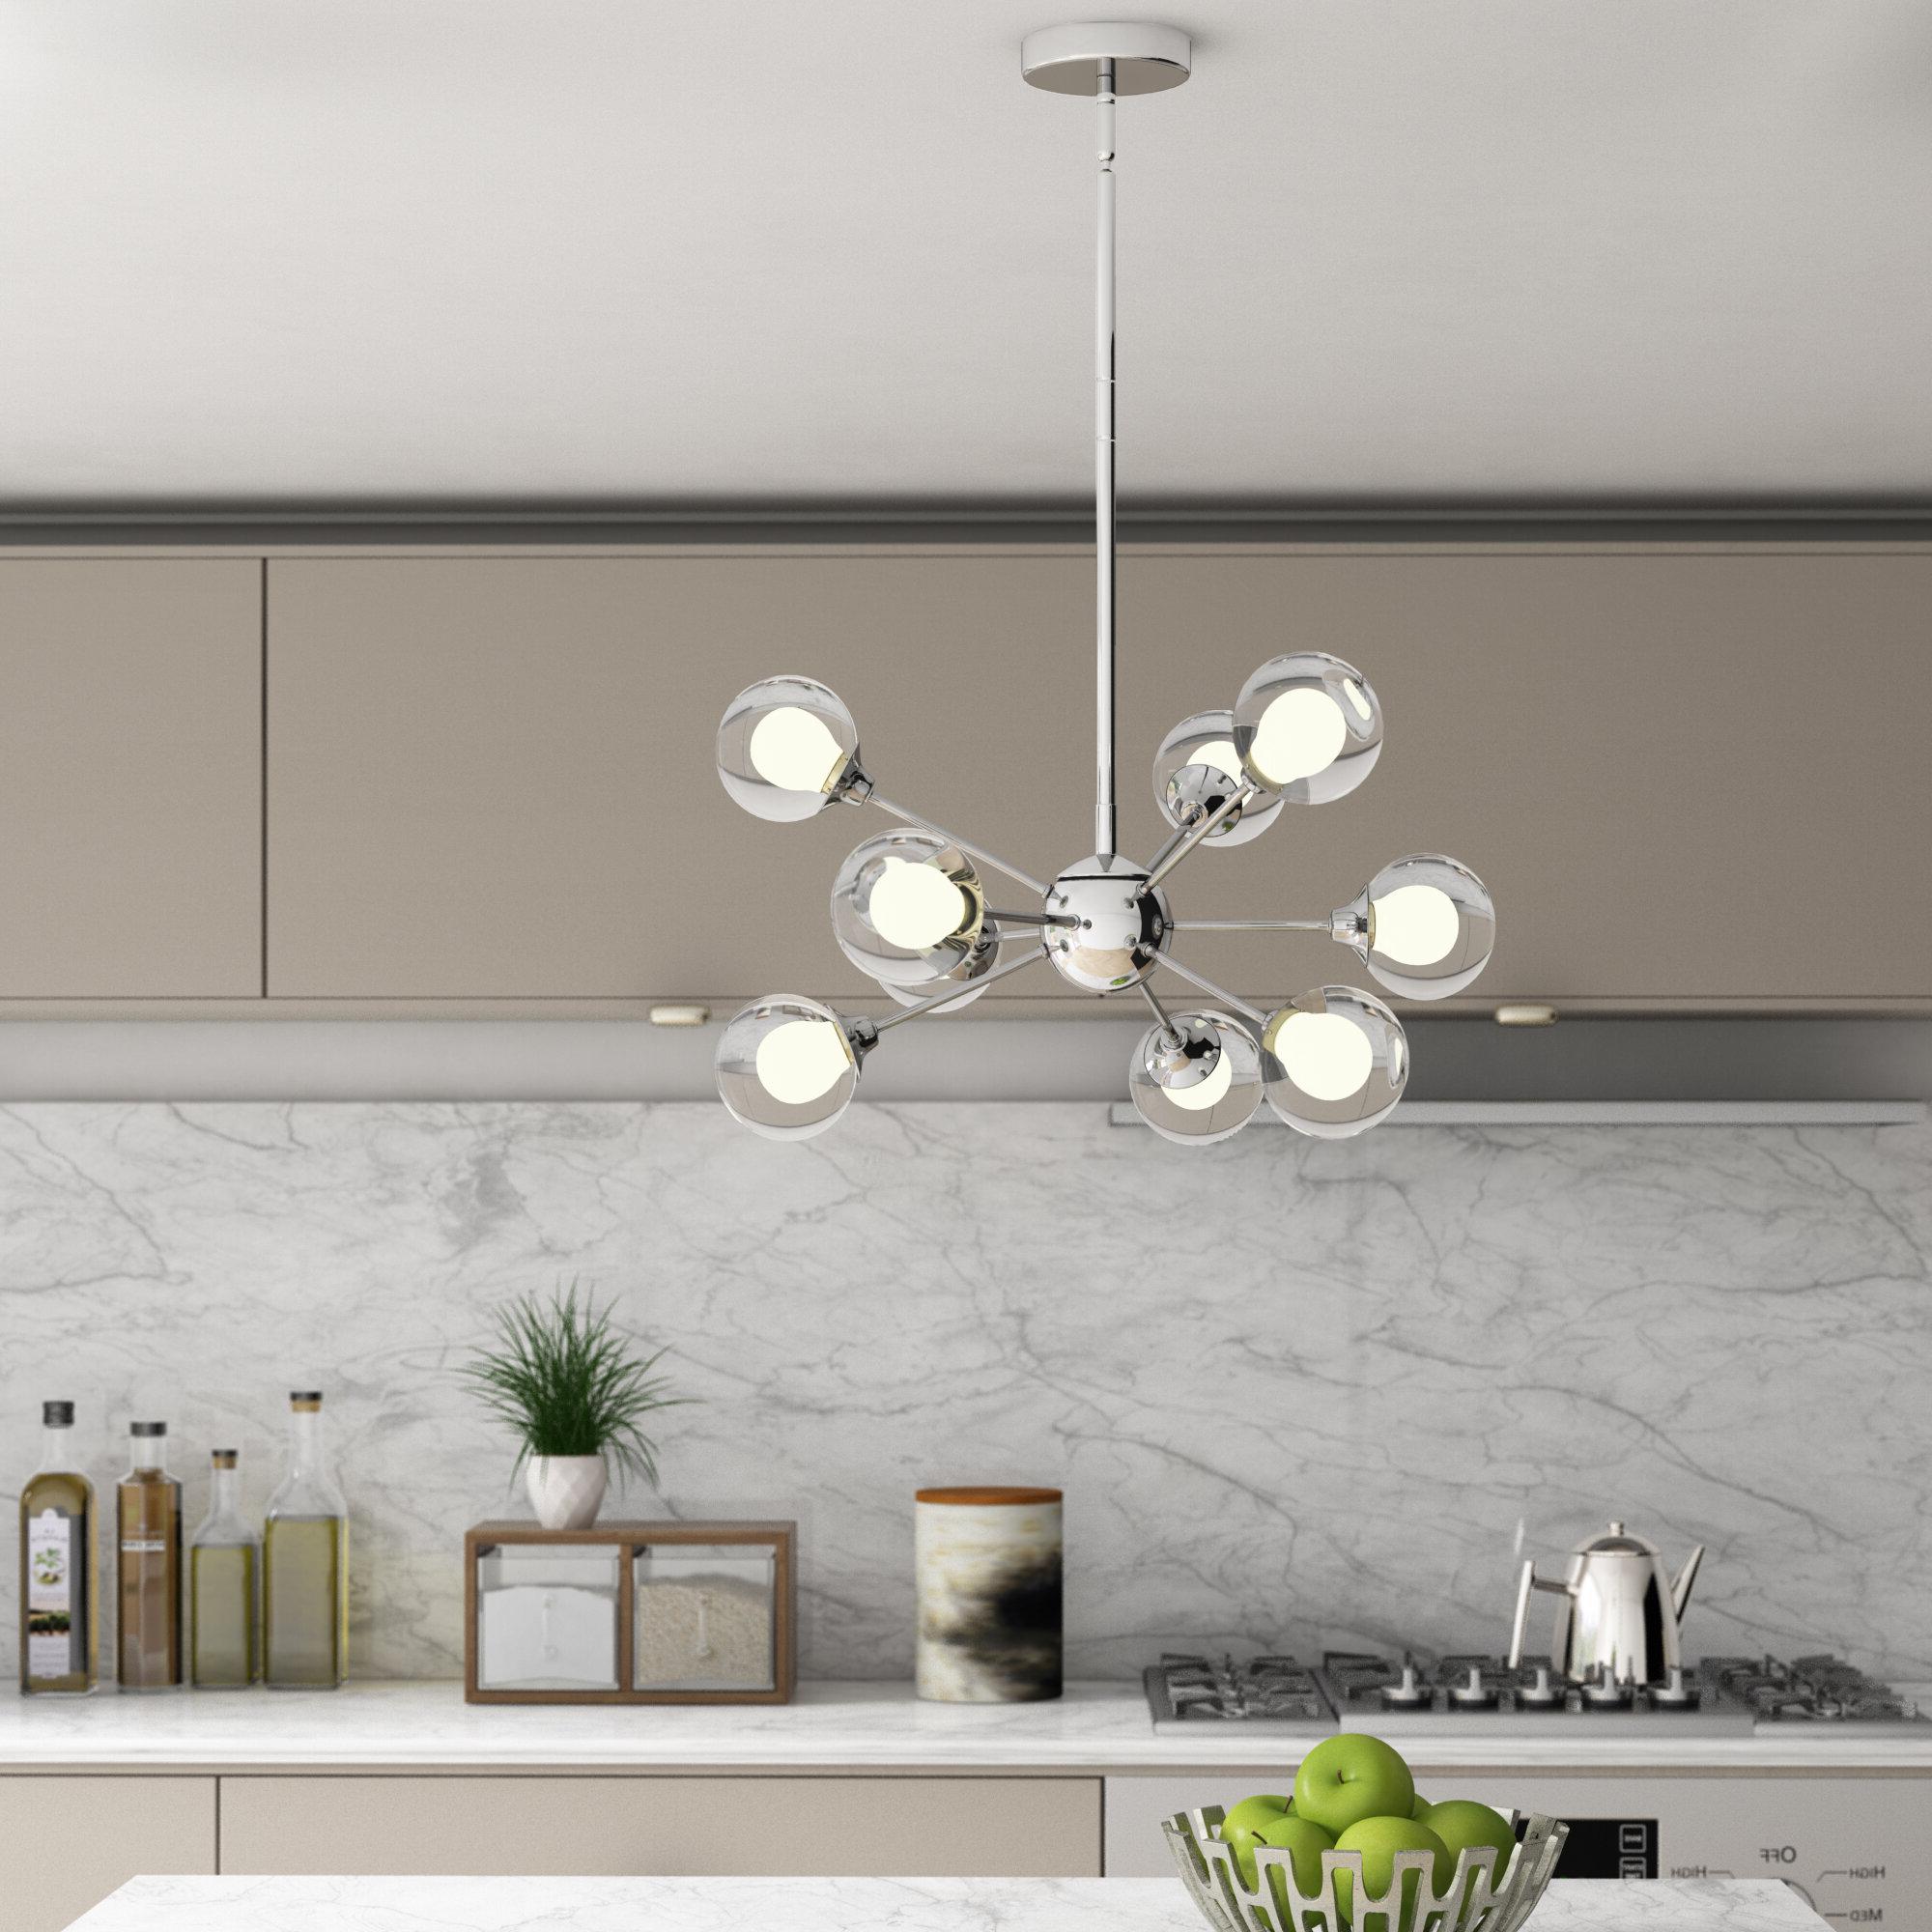 Modern Rustic Interiors Dawn Rembert 9 Light Chandelier With Regard To Favorite Mcknight 9 Light Chandeliers (View 11 of 20)